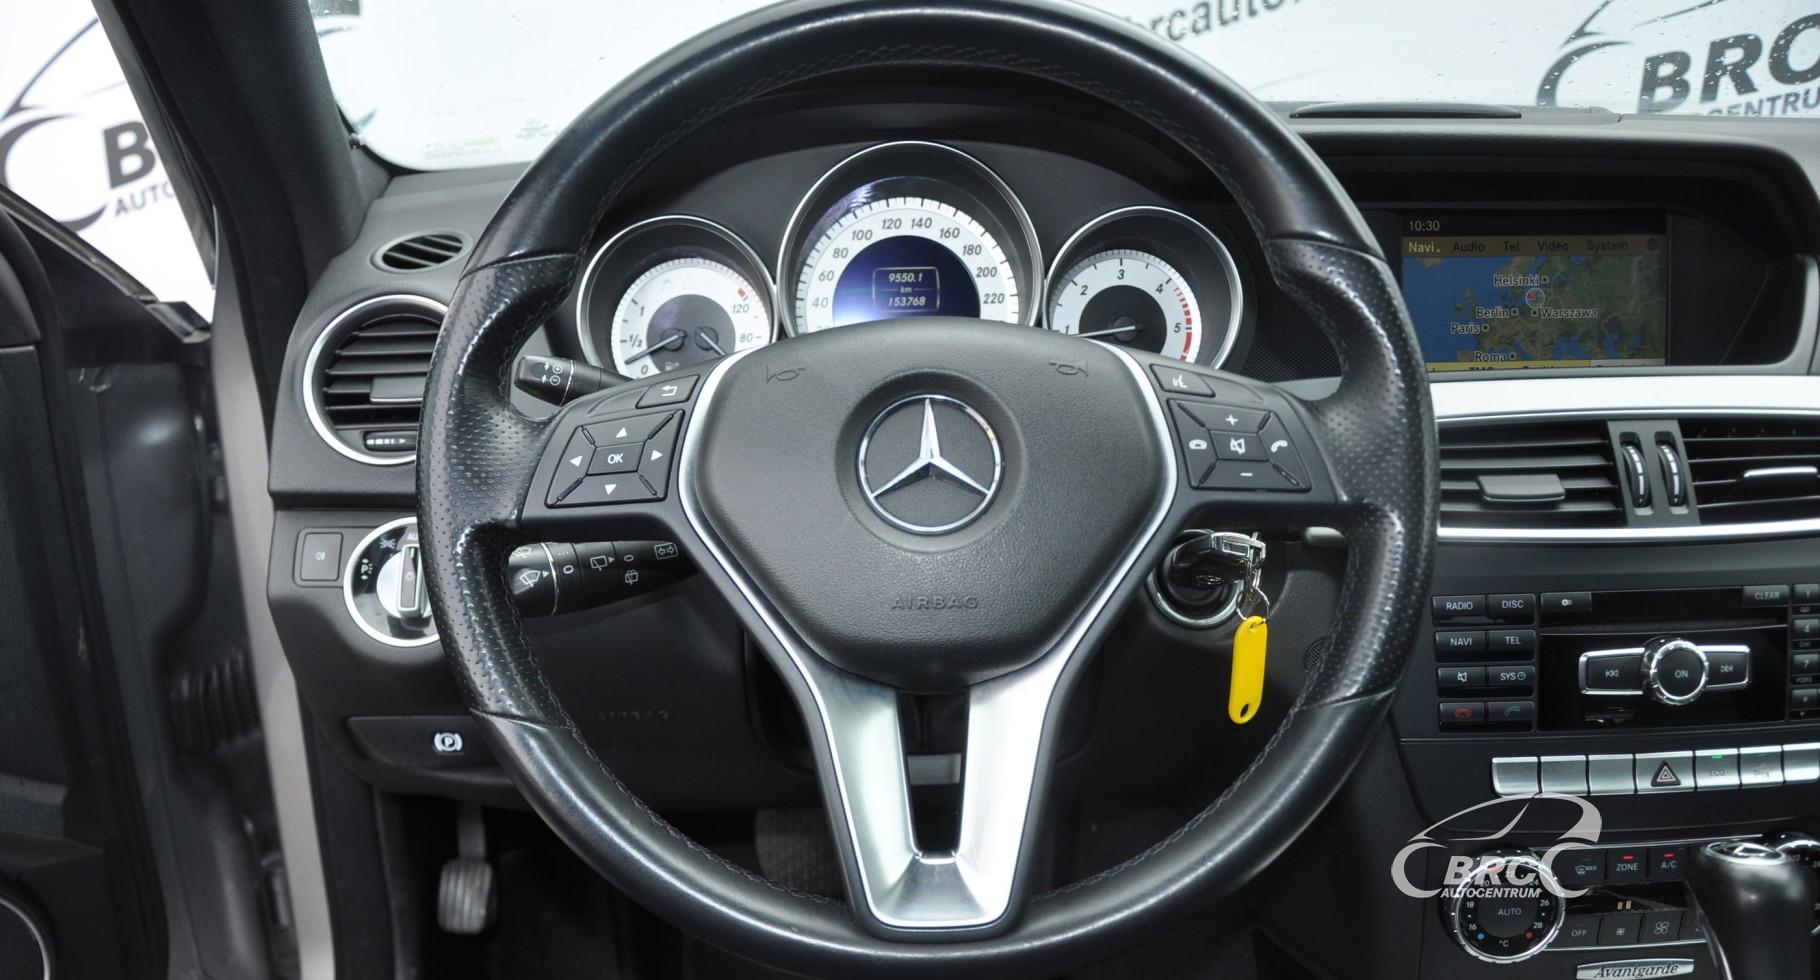 Mercedes-Benz C 220 CDI Avantgarde Automatas